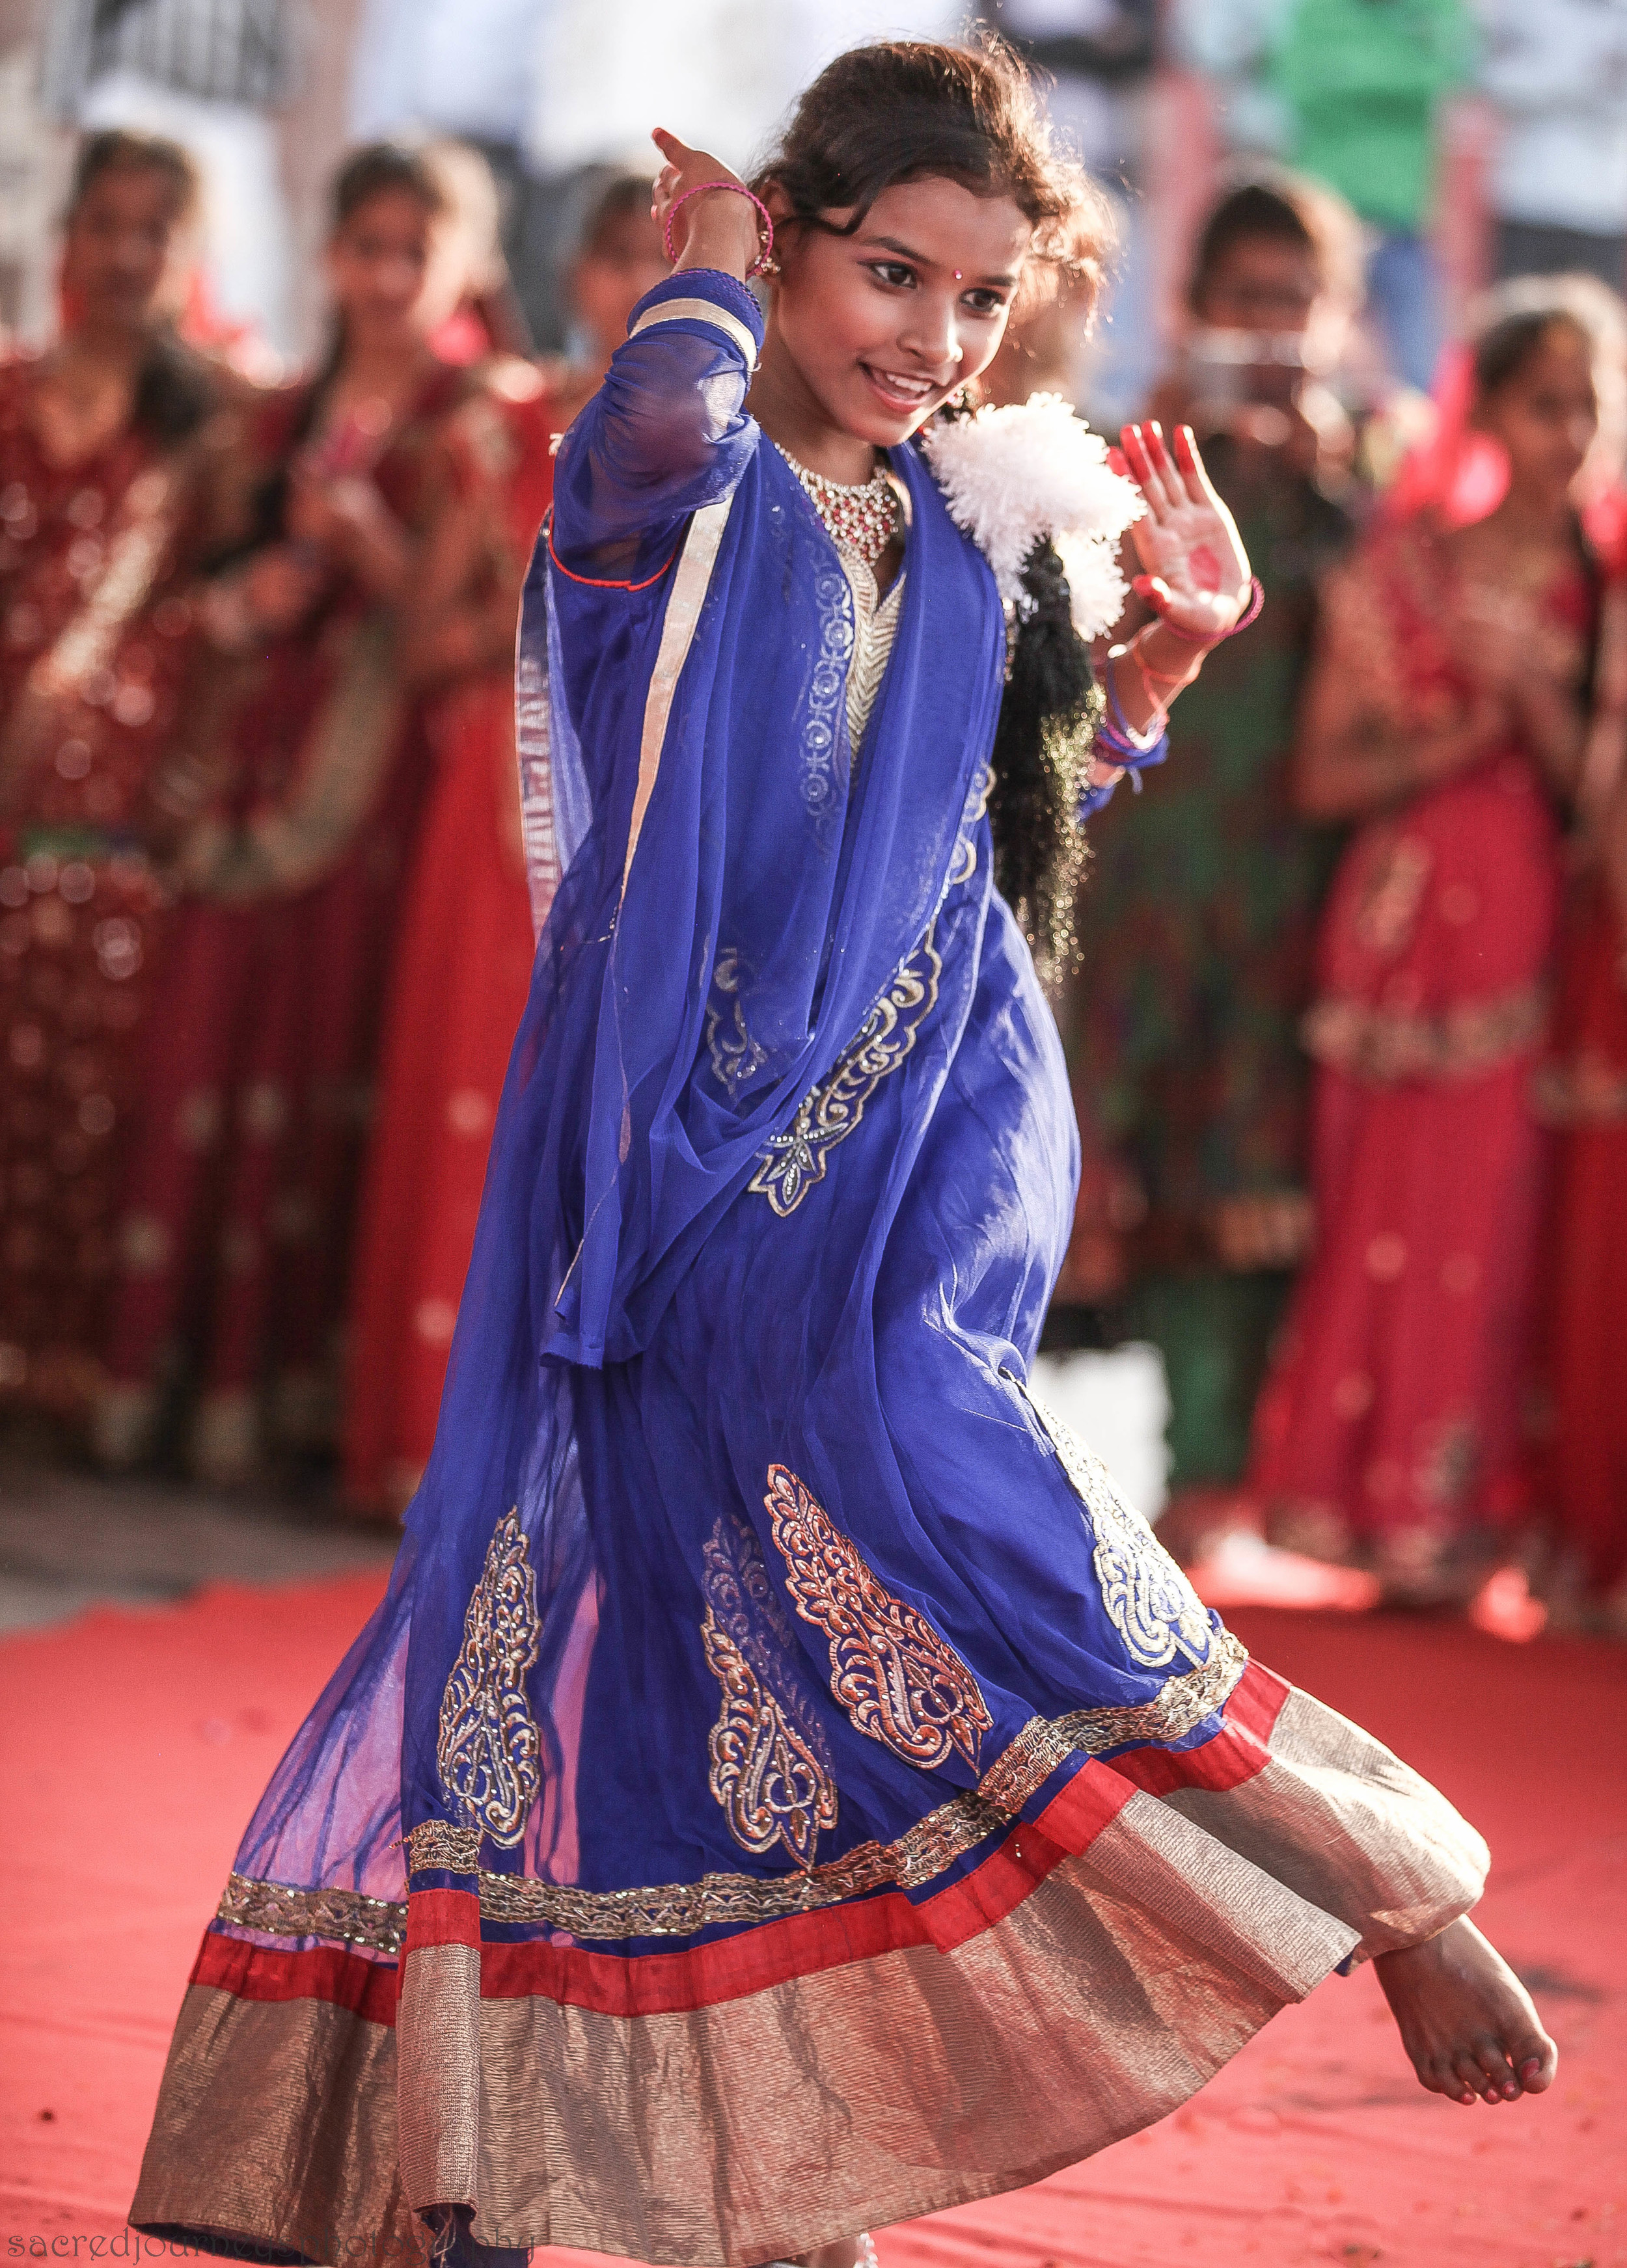 Young dancer during Shivratri   celebration in Varanasi